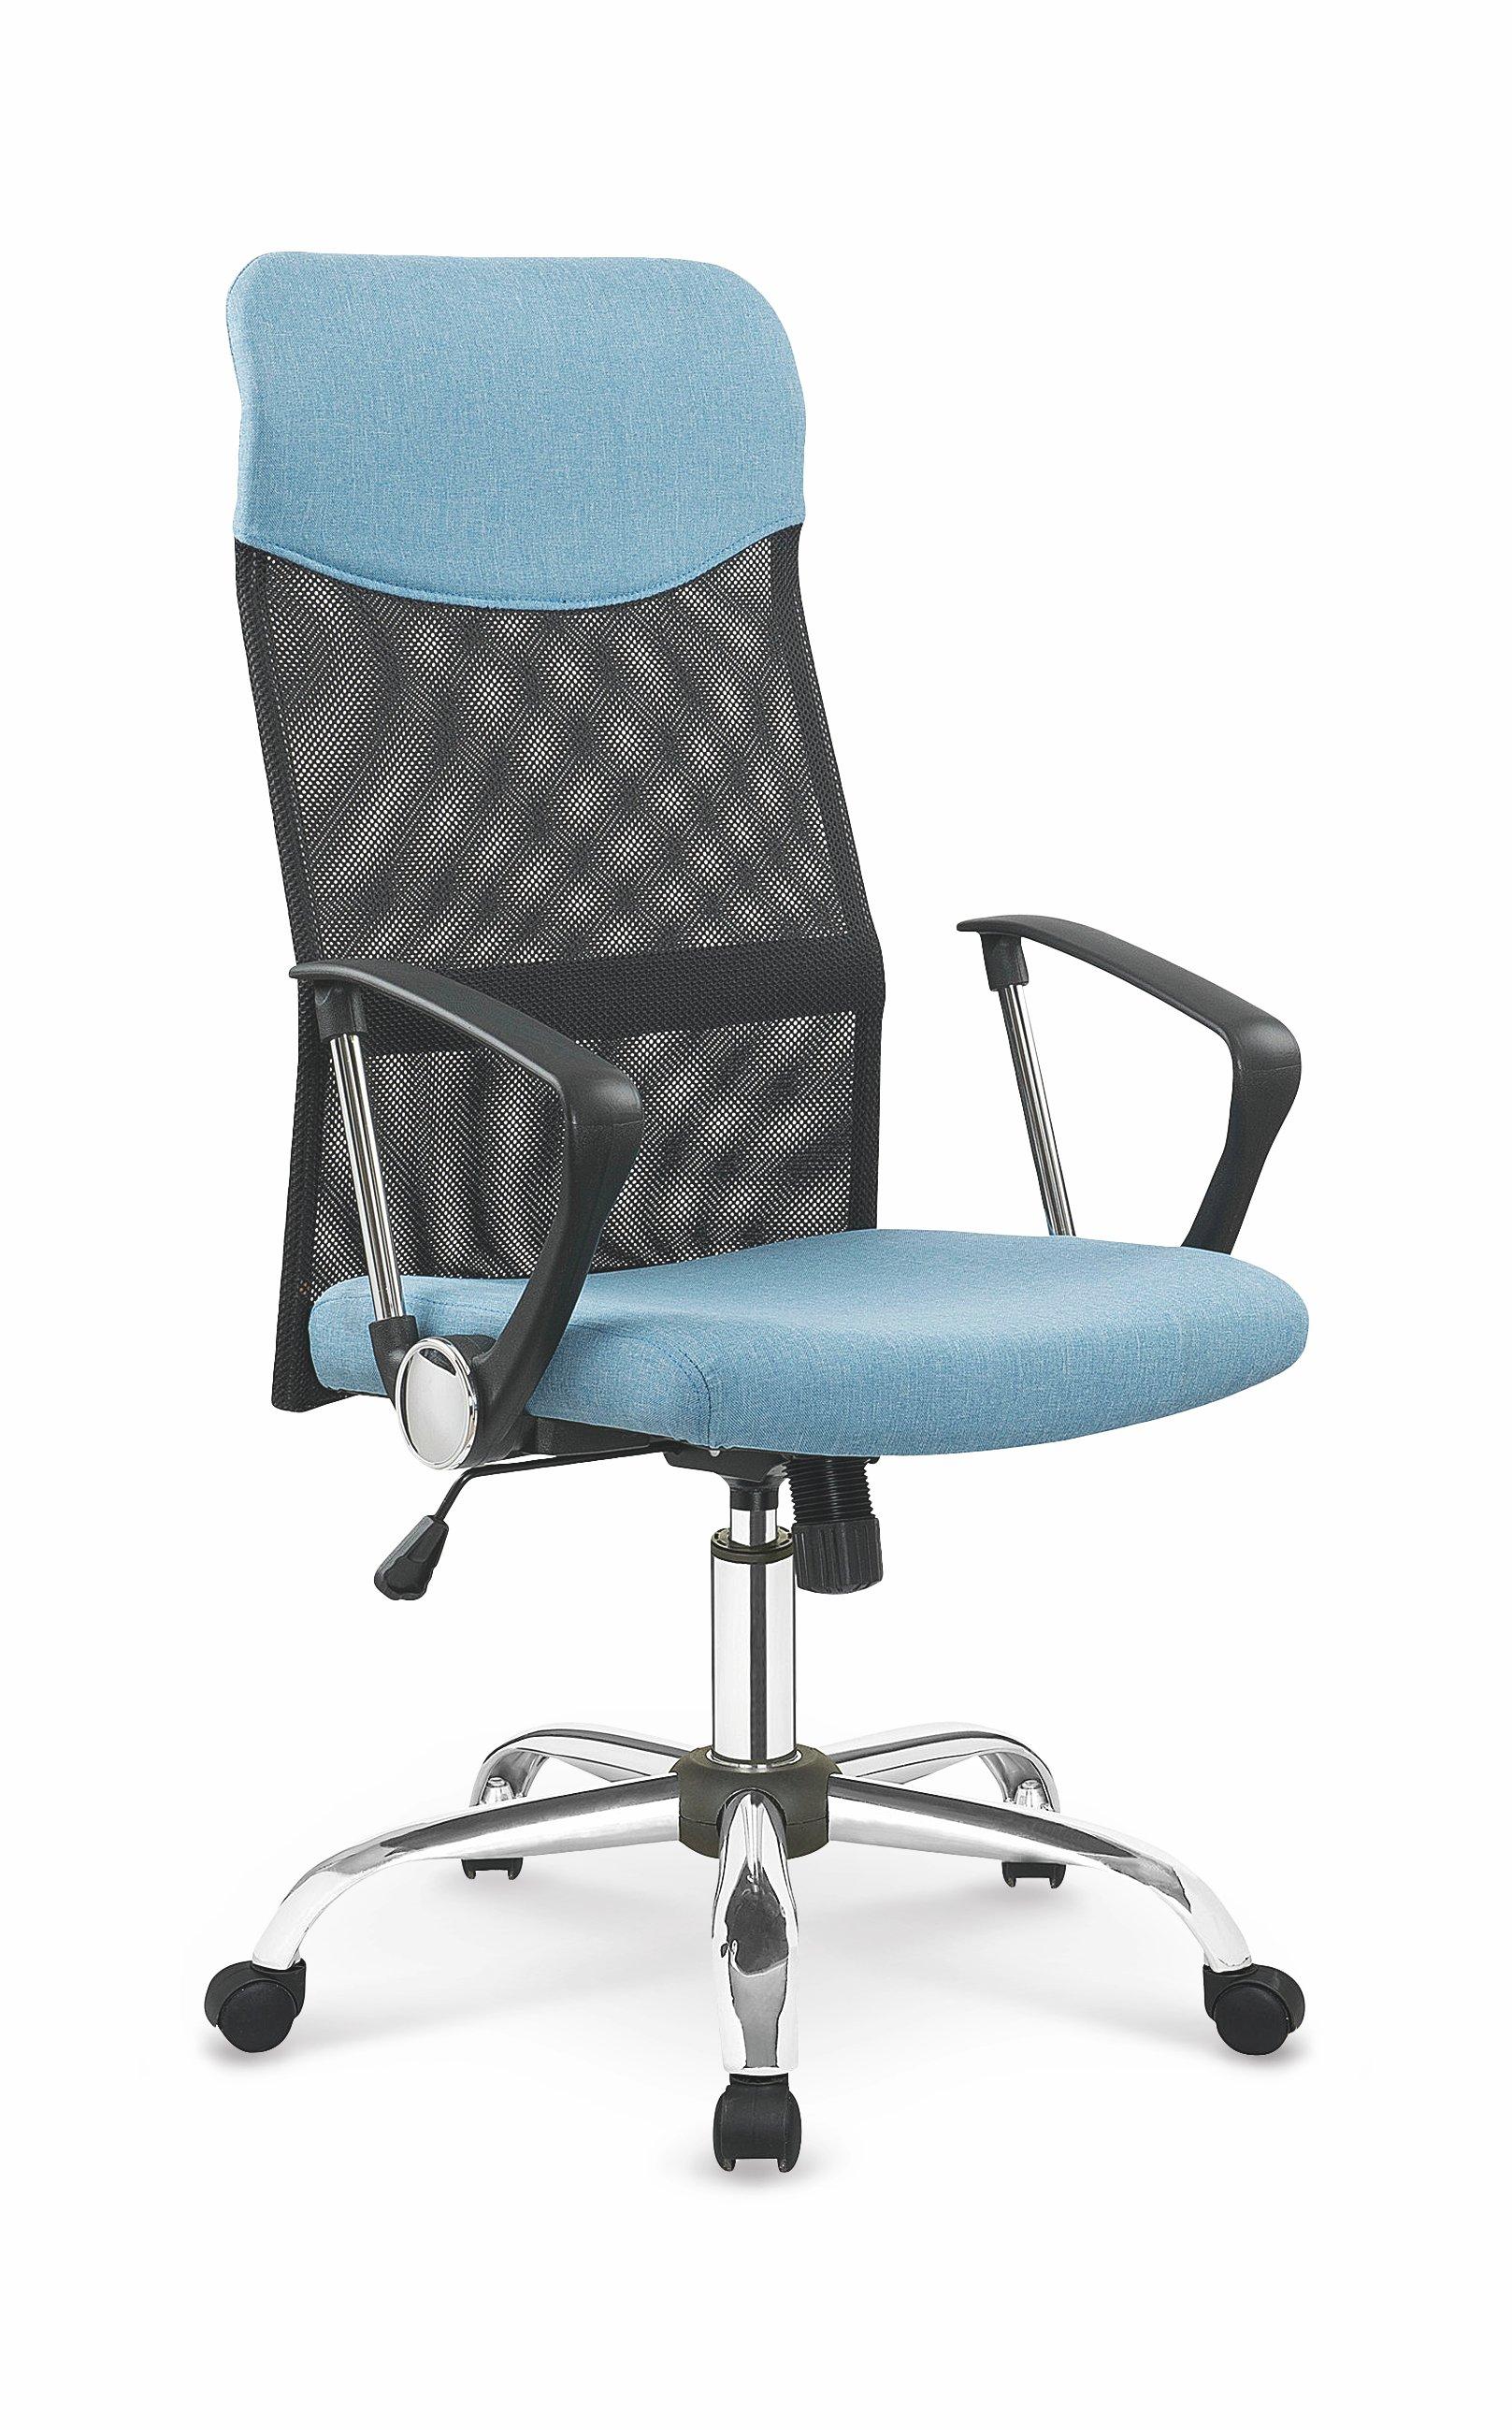 Kancelářská židle - Halmar - Vire 2 (černá + modrá)